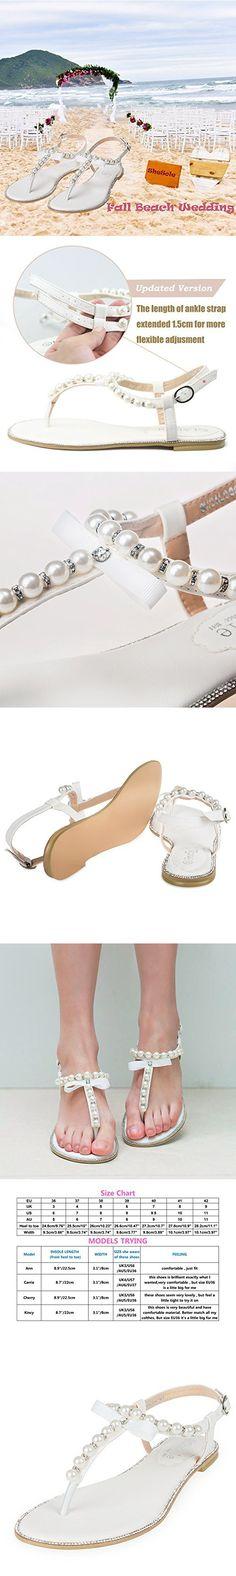 SHOEZY Womens Pu Leather Flat Sandals Wedding Pearls Rhinestone Thong Strap Gladiator Shoes US 7